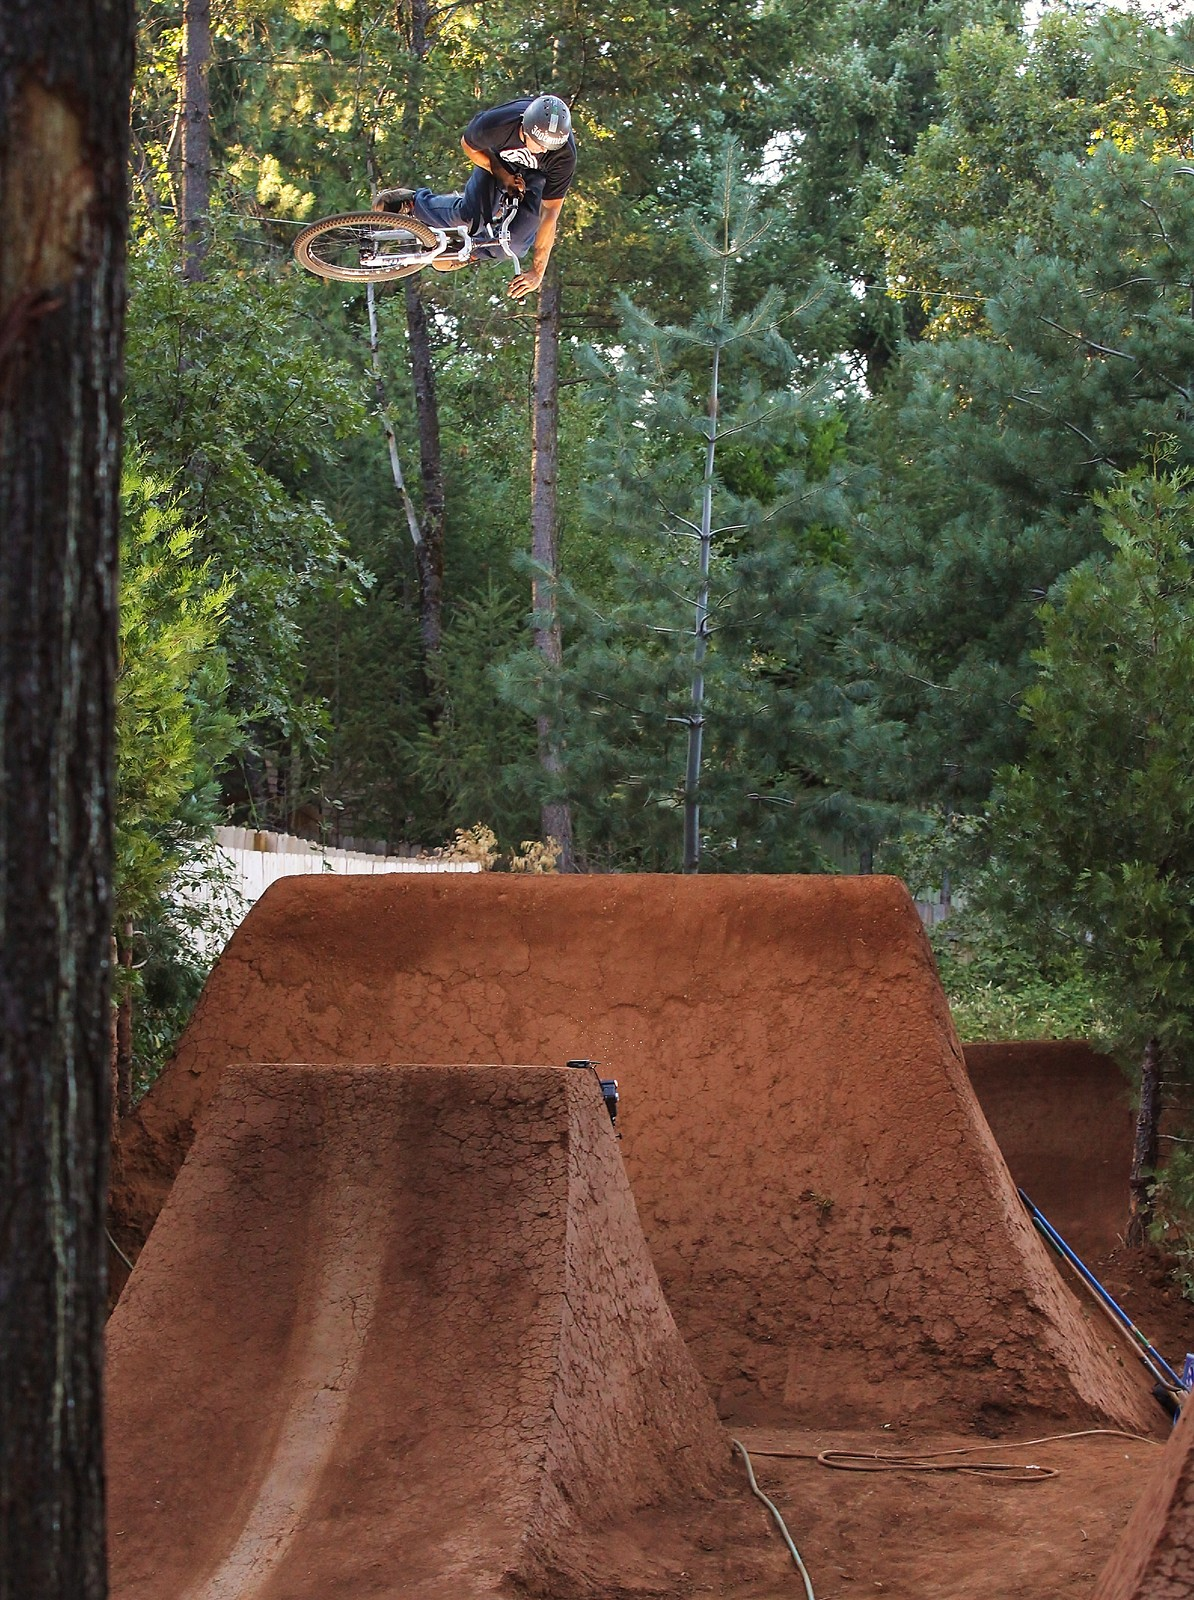 099  - ZD - Mountain Biking Pictures - Vital MTB